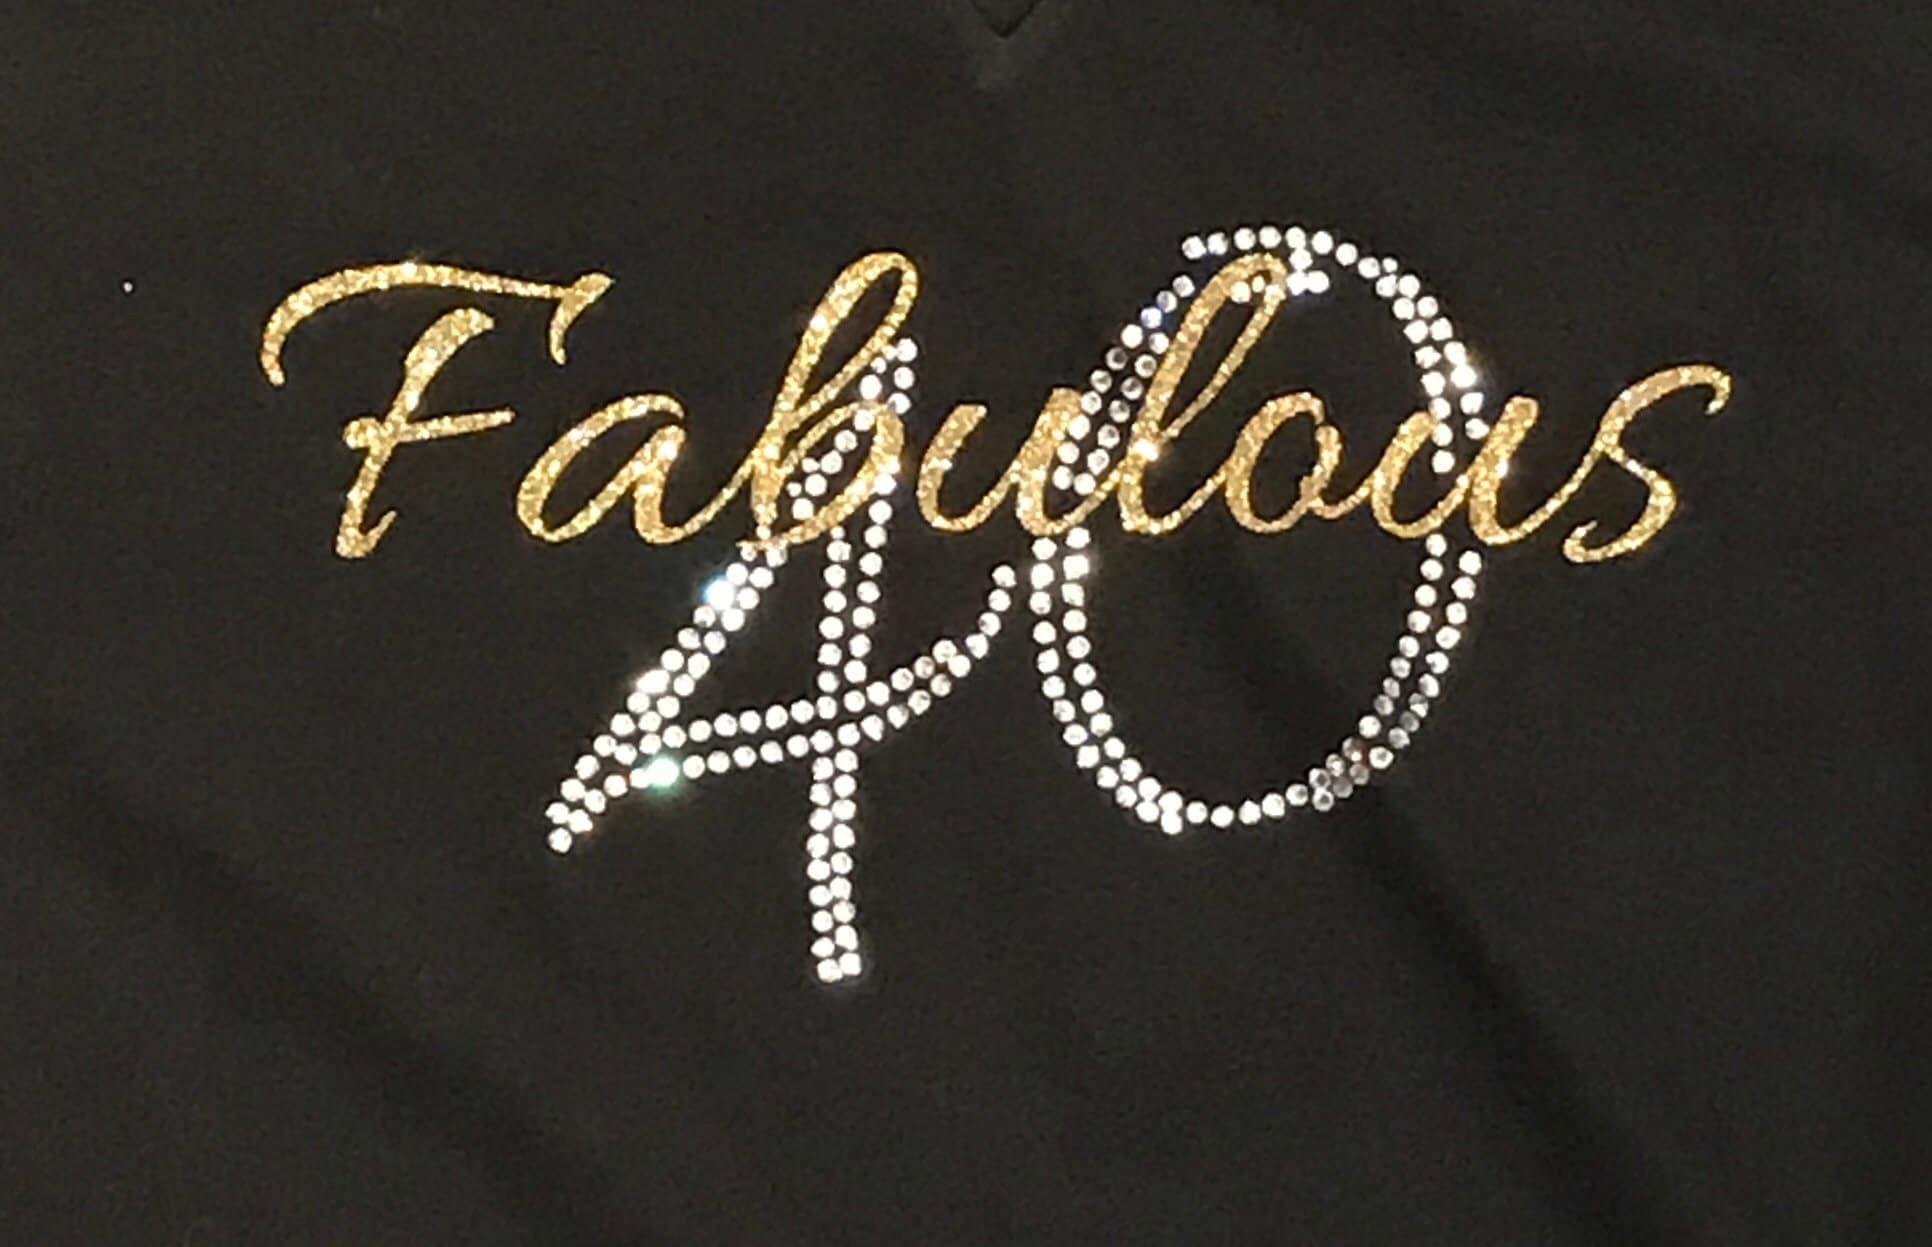 ed3005a6 Custom Rhinestone BLiNg Fabulous 40 Shirt   40th Birthday Shirts ...